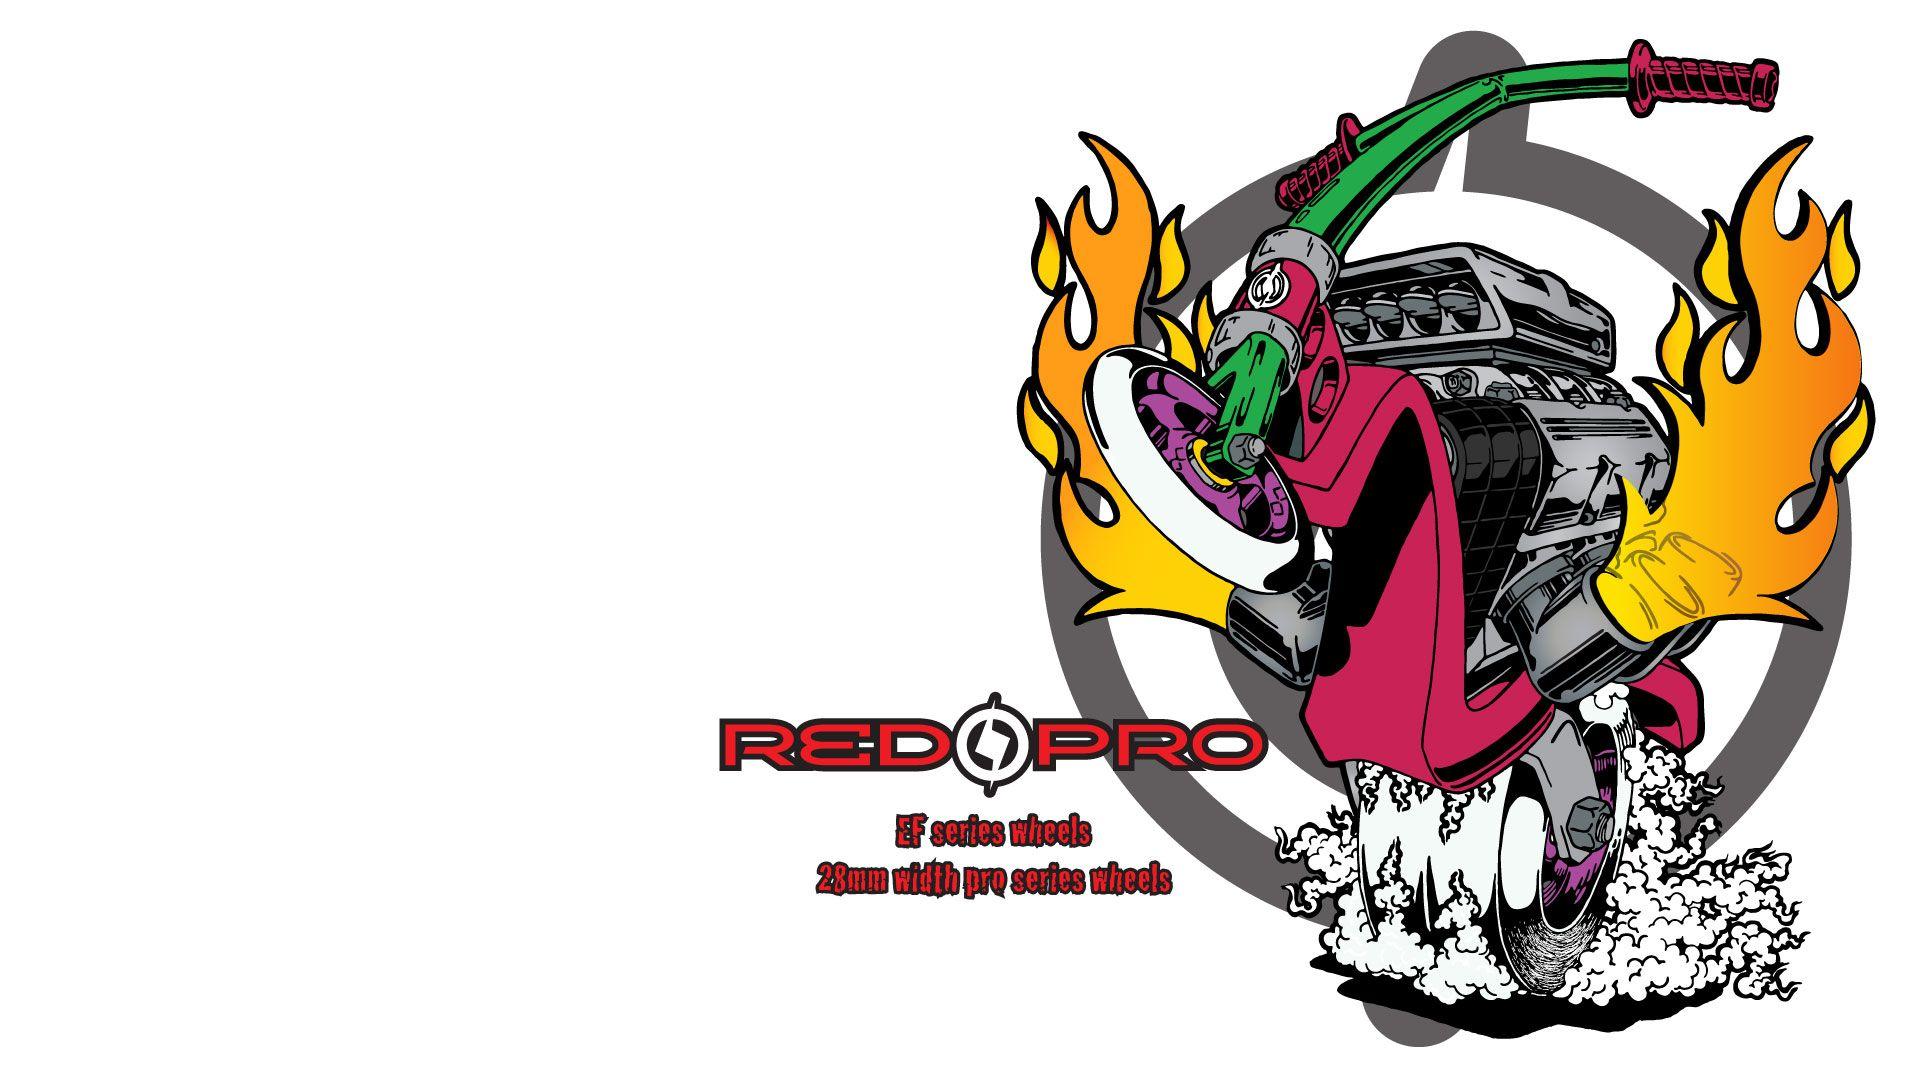 Store Red Wheel Full Hd Desktop Wallpaper At Httpwallindacomwallpaper( )